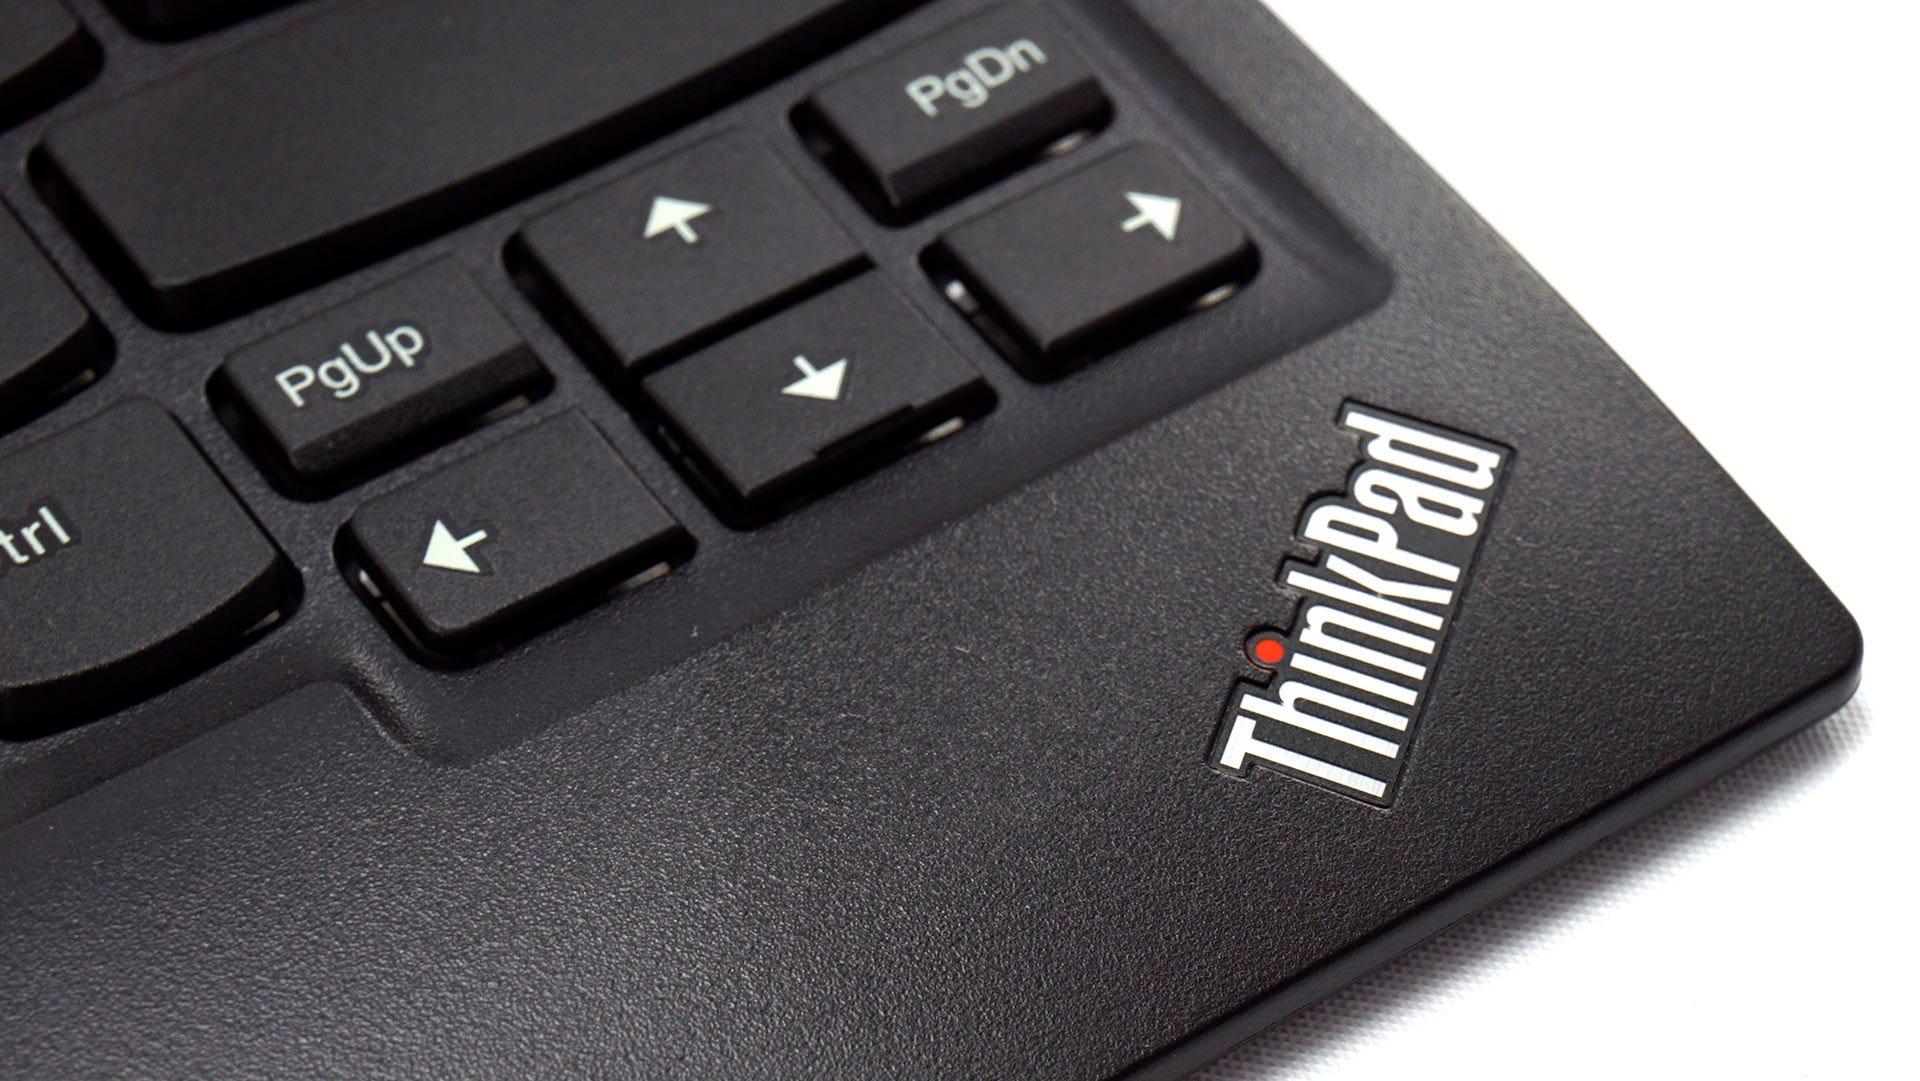 ThinkPad logo on keyboard